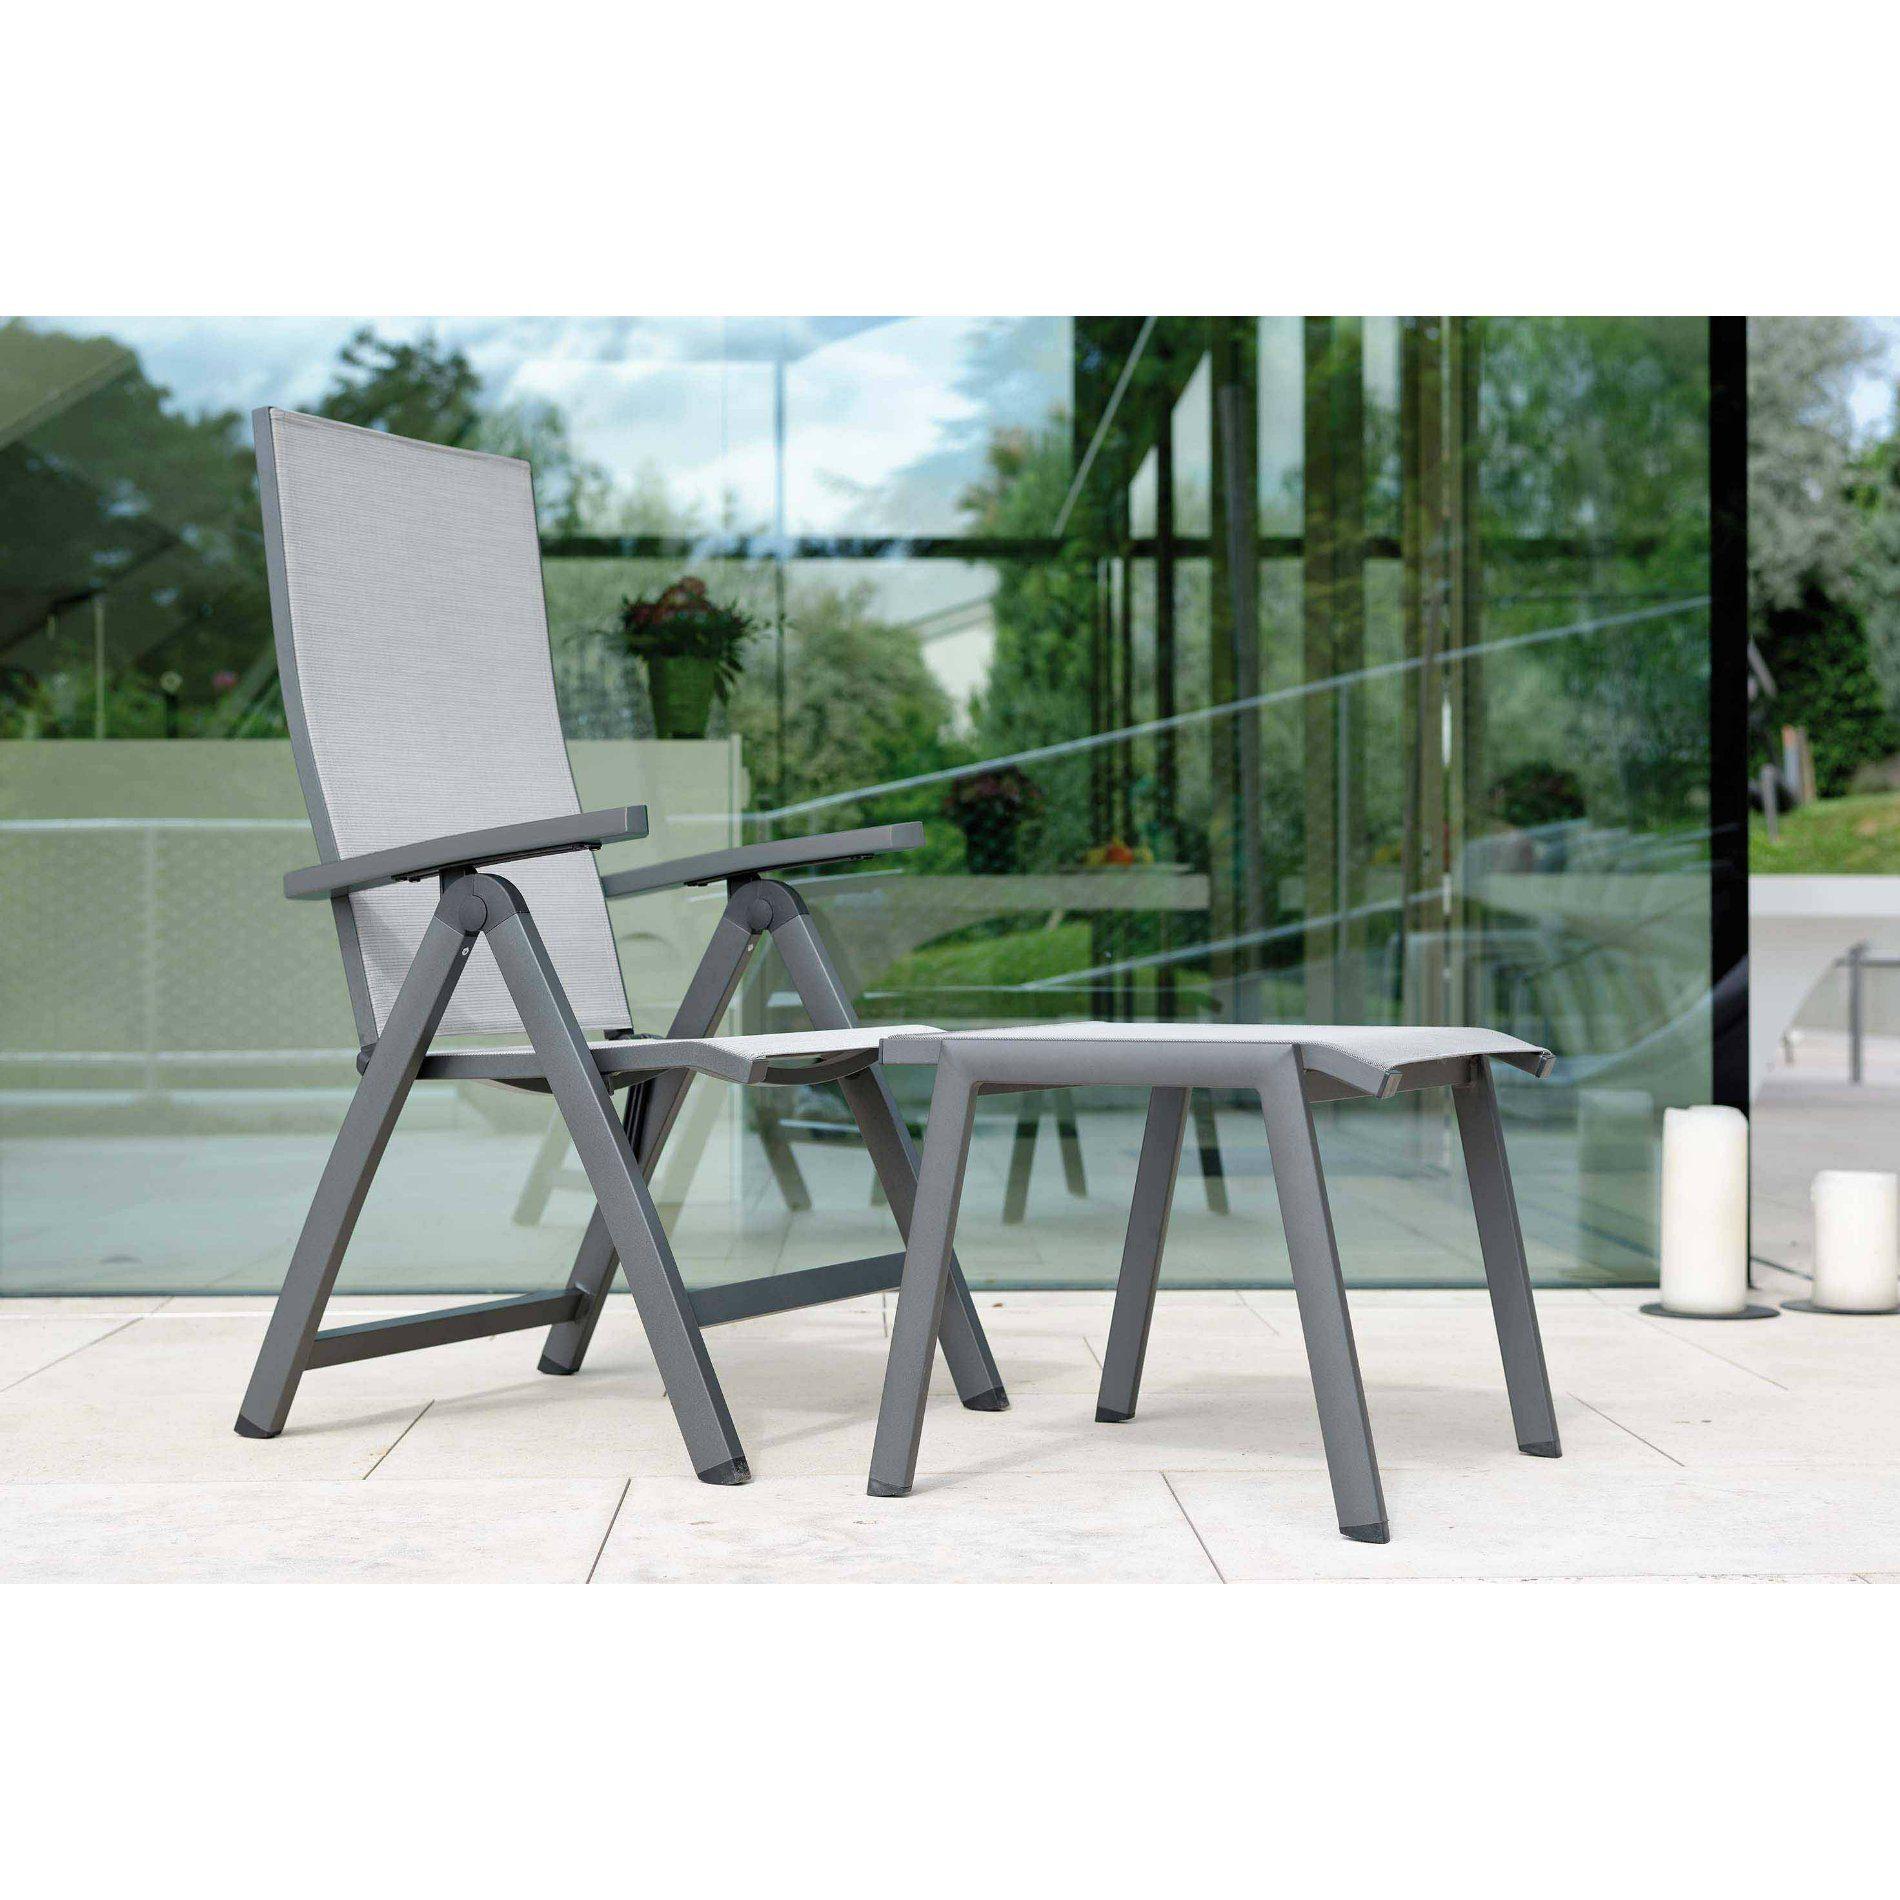 stern new top gartenstuhl verstellbar. Black Bedroom Furniture Sets. Home Design Ideas